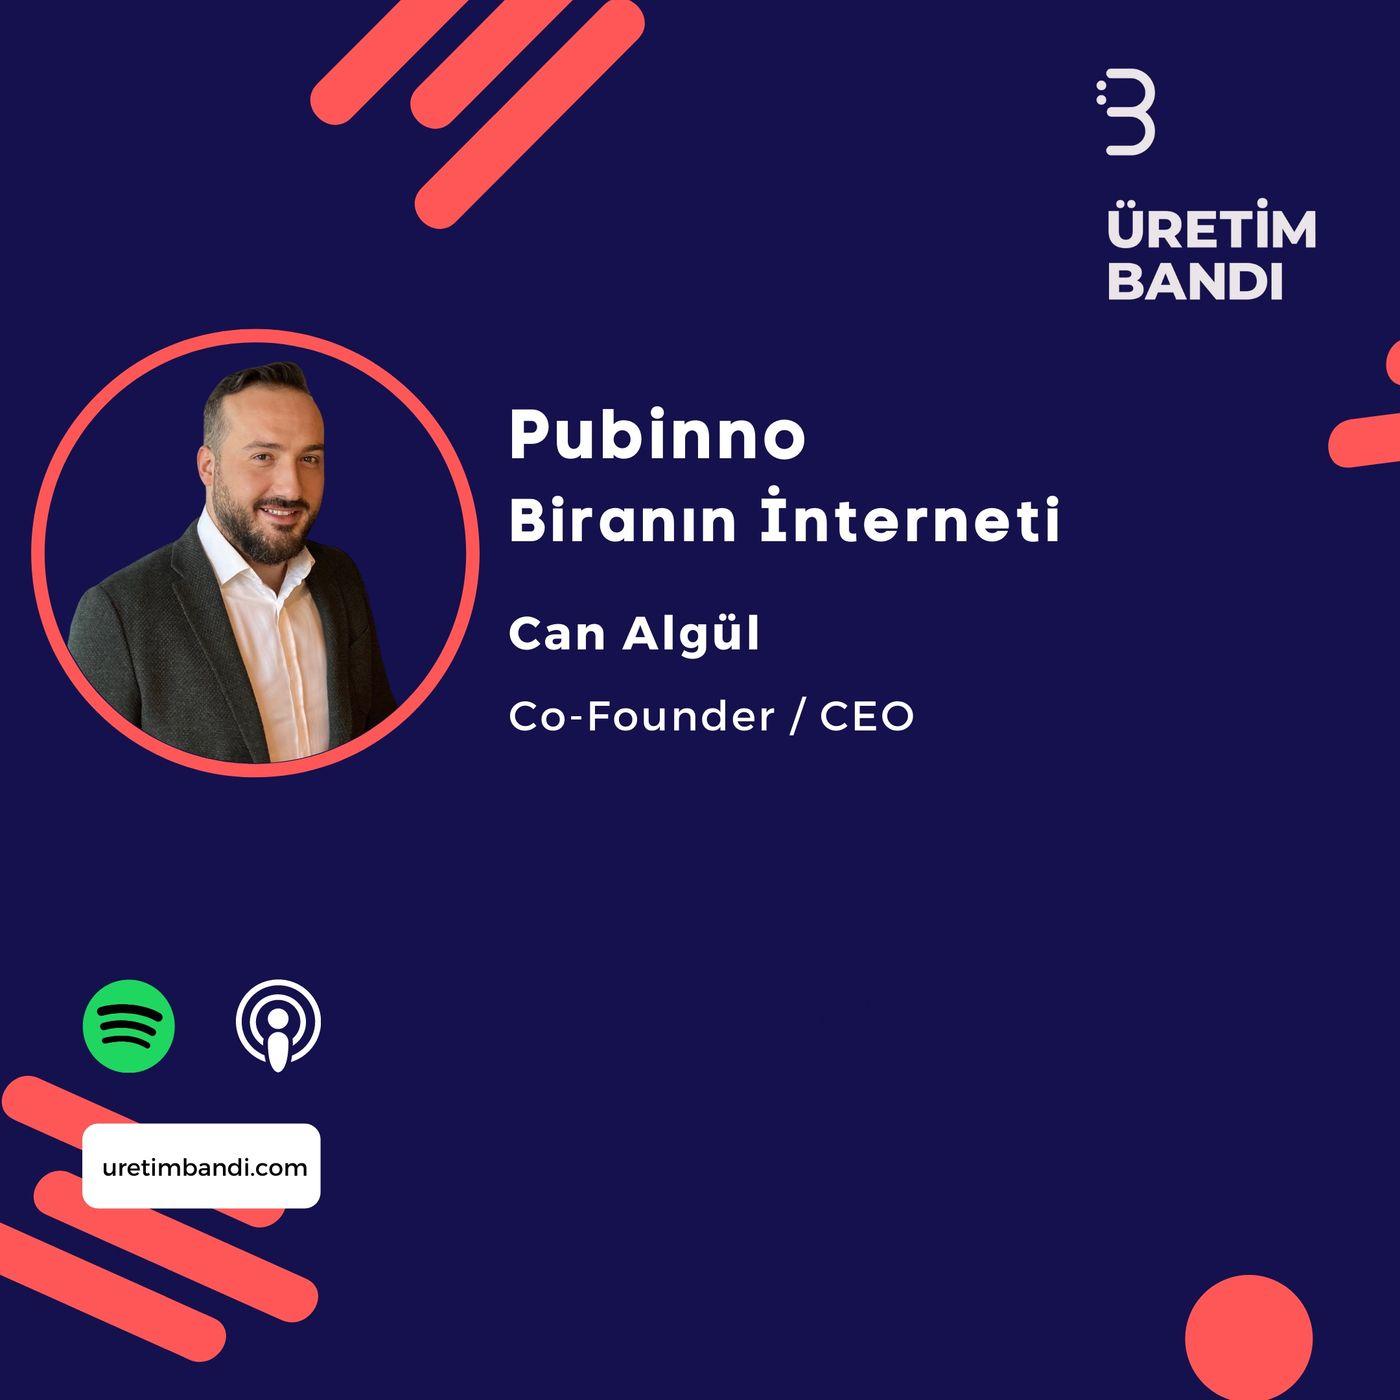 Can Algül ile Pubinno - Biranın İnterneti